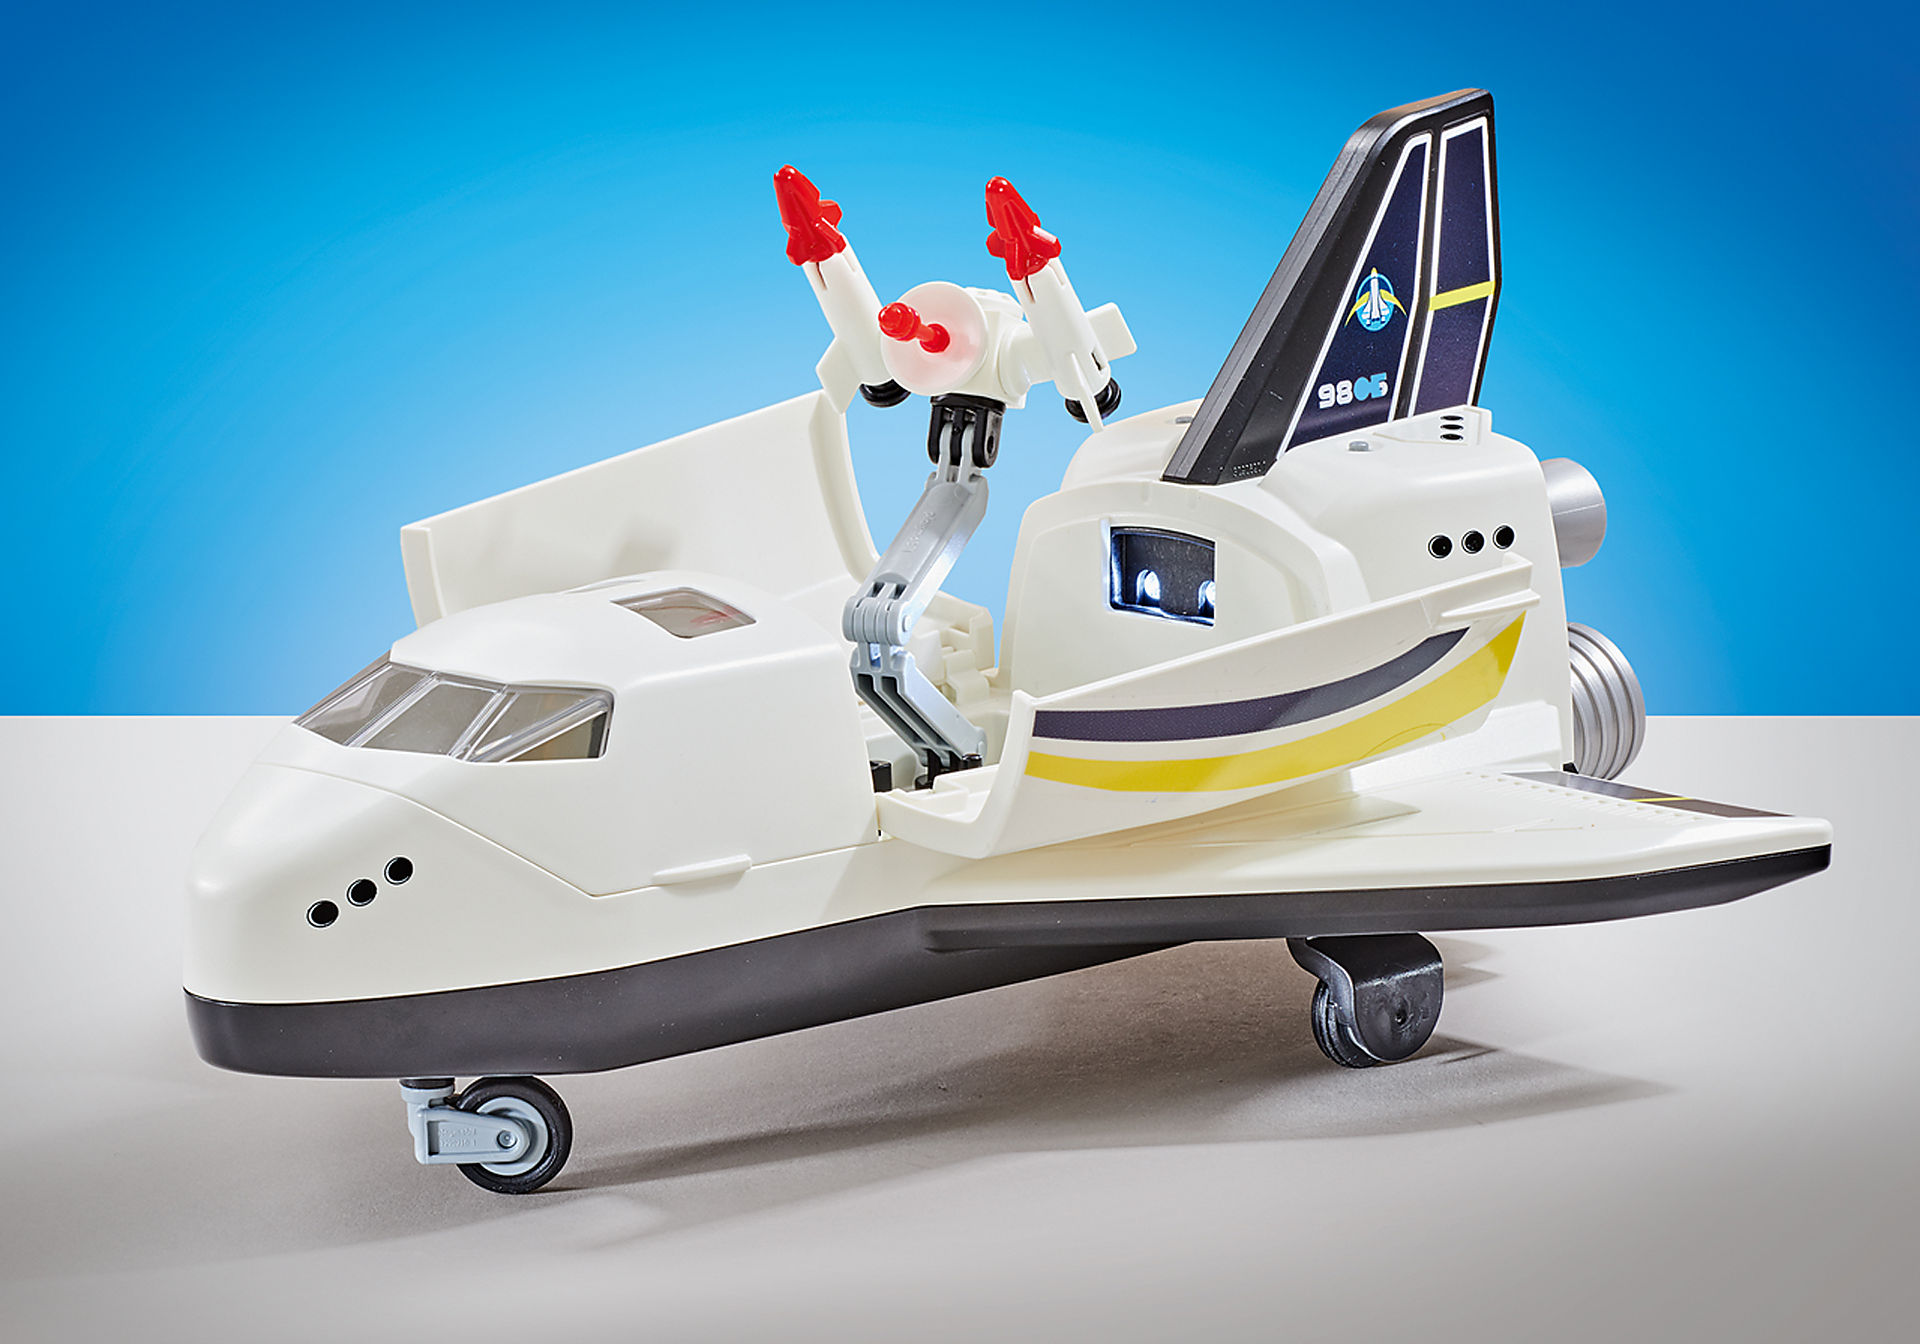 http://media.playmobil.com/i/playmobil/9805_product_detail/Διαστημικό λεωφορείο